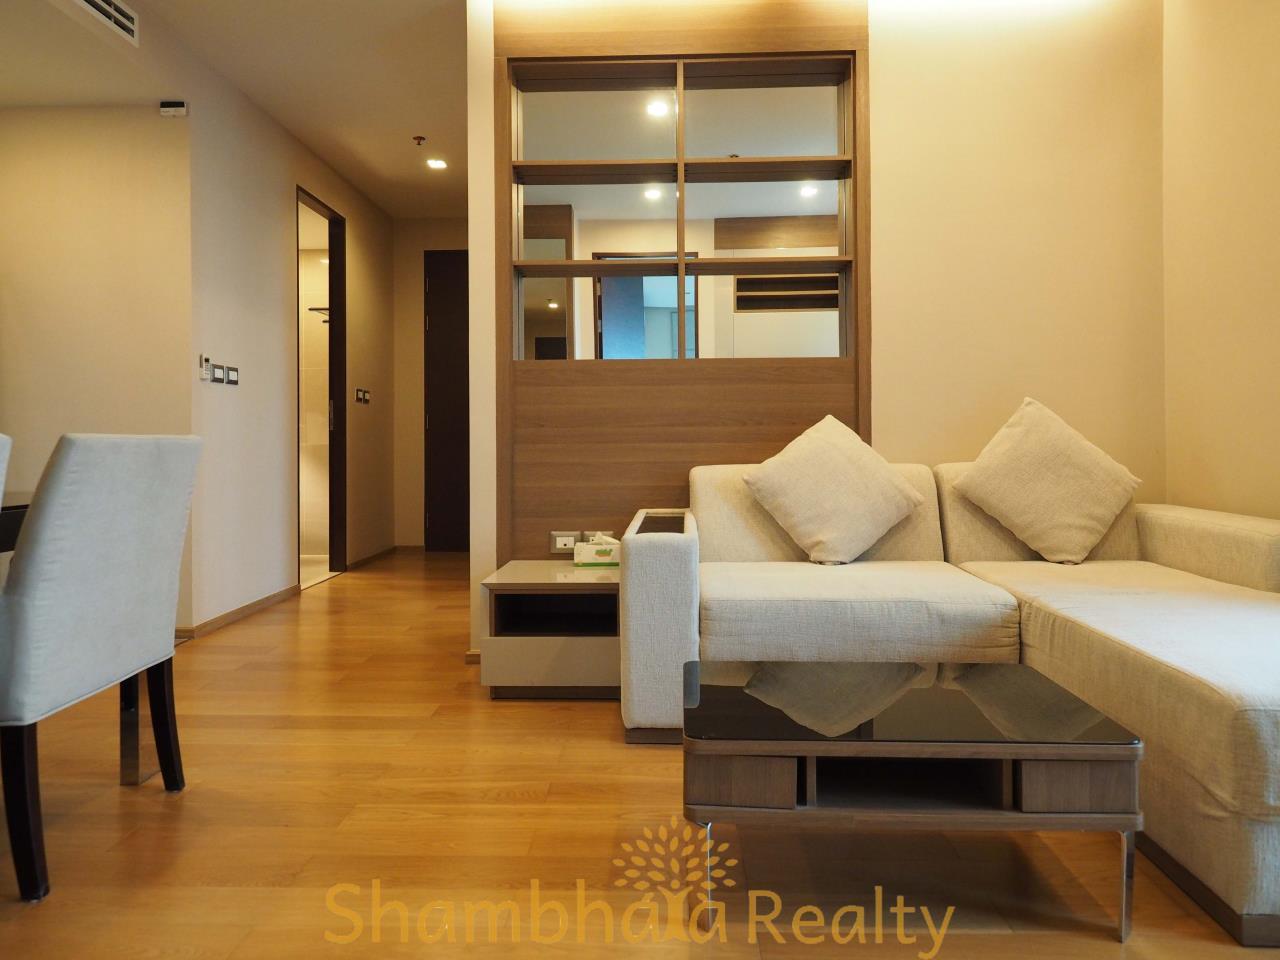 Shambhala Realty Agency's The Address Asoke Condominium for Rent in Petchaburi-tudmai 8